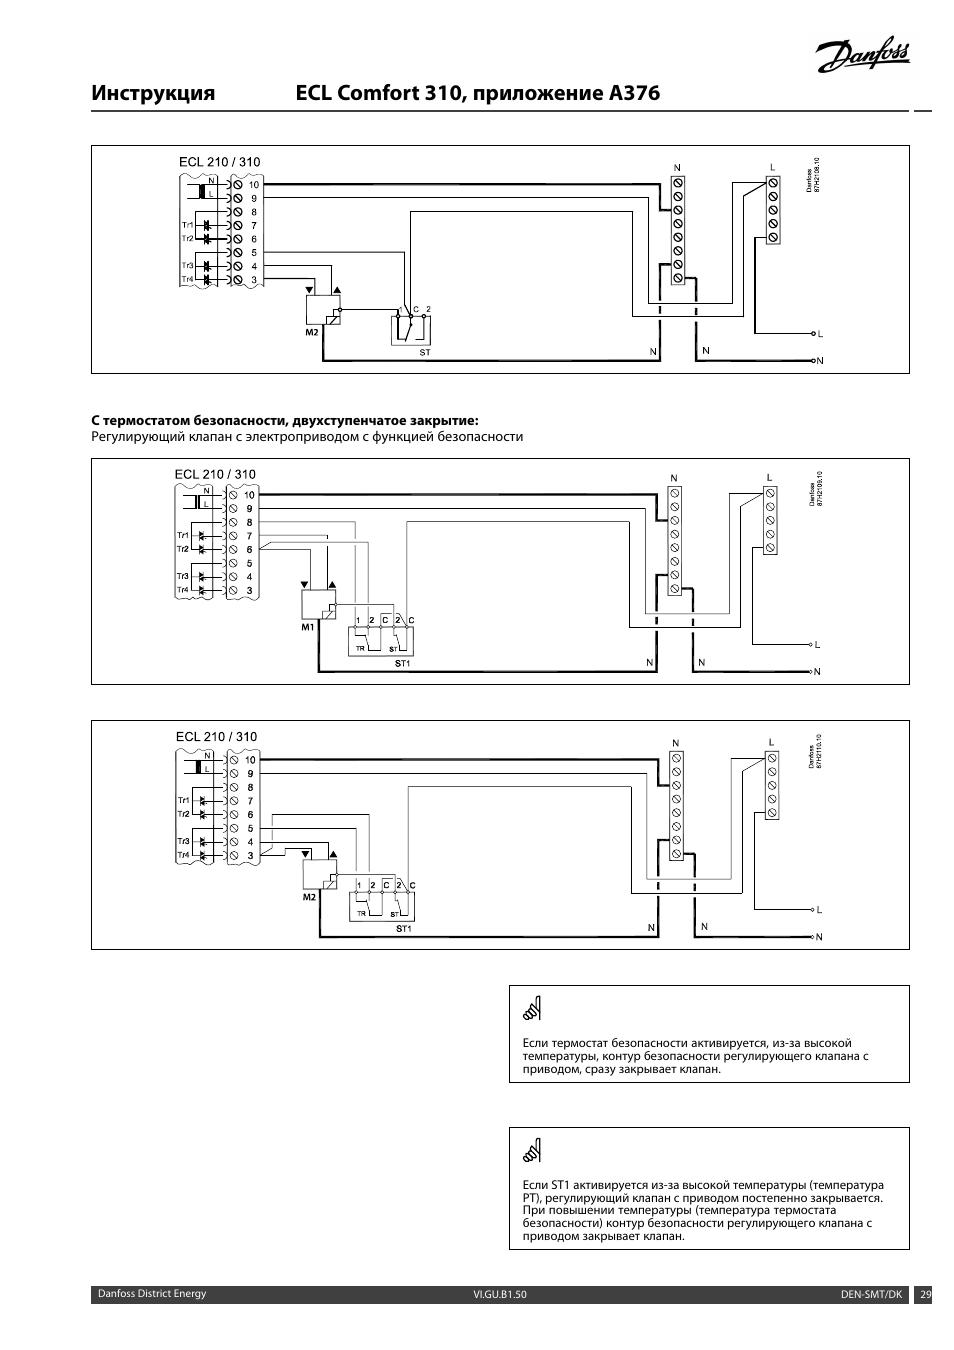 ecl comfort 310 инструкция по эксплуатации a376